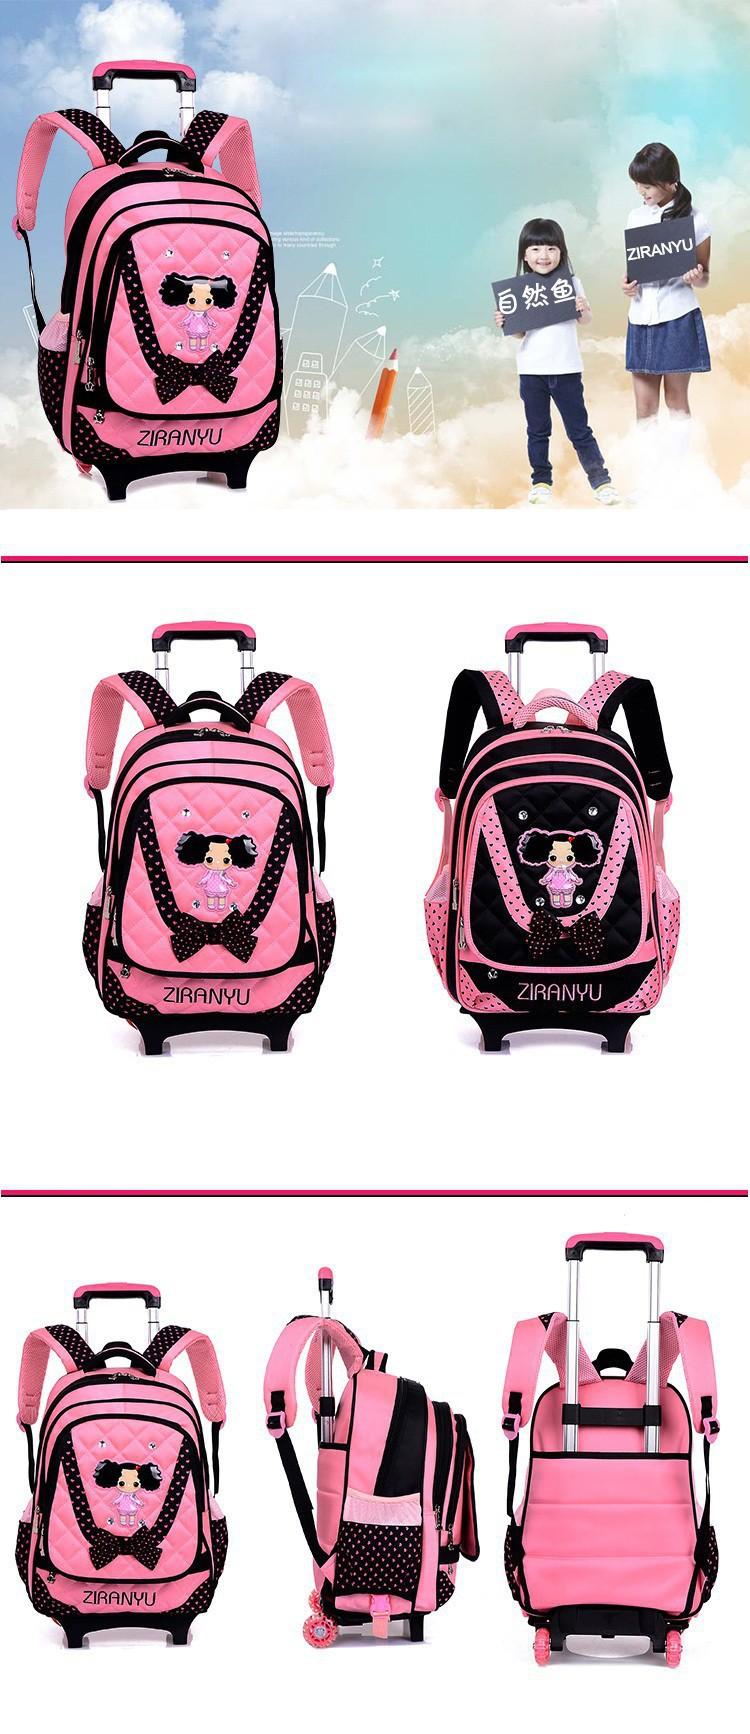 kids-wheeled-school-backpack-children-school-trolley-backpack-carton-pattern-rolling-luggage-kids-detachable-and-orthopedic-1